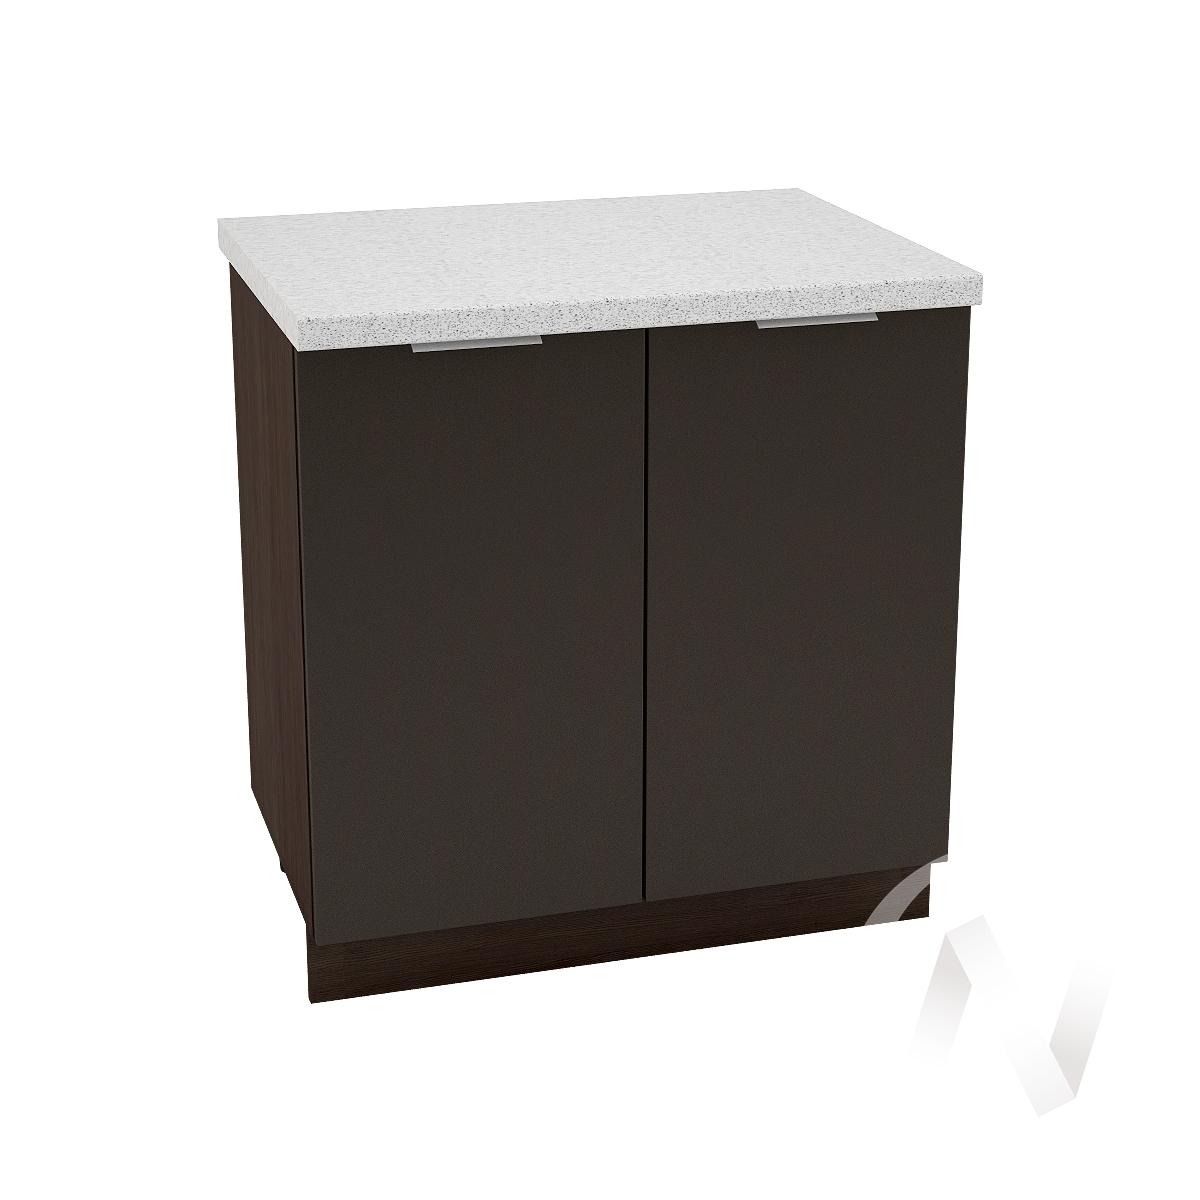 "Кухня ""Терра"": Шкаф нижний 800, ШН 800 (смоки софт/корпус венге)"